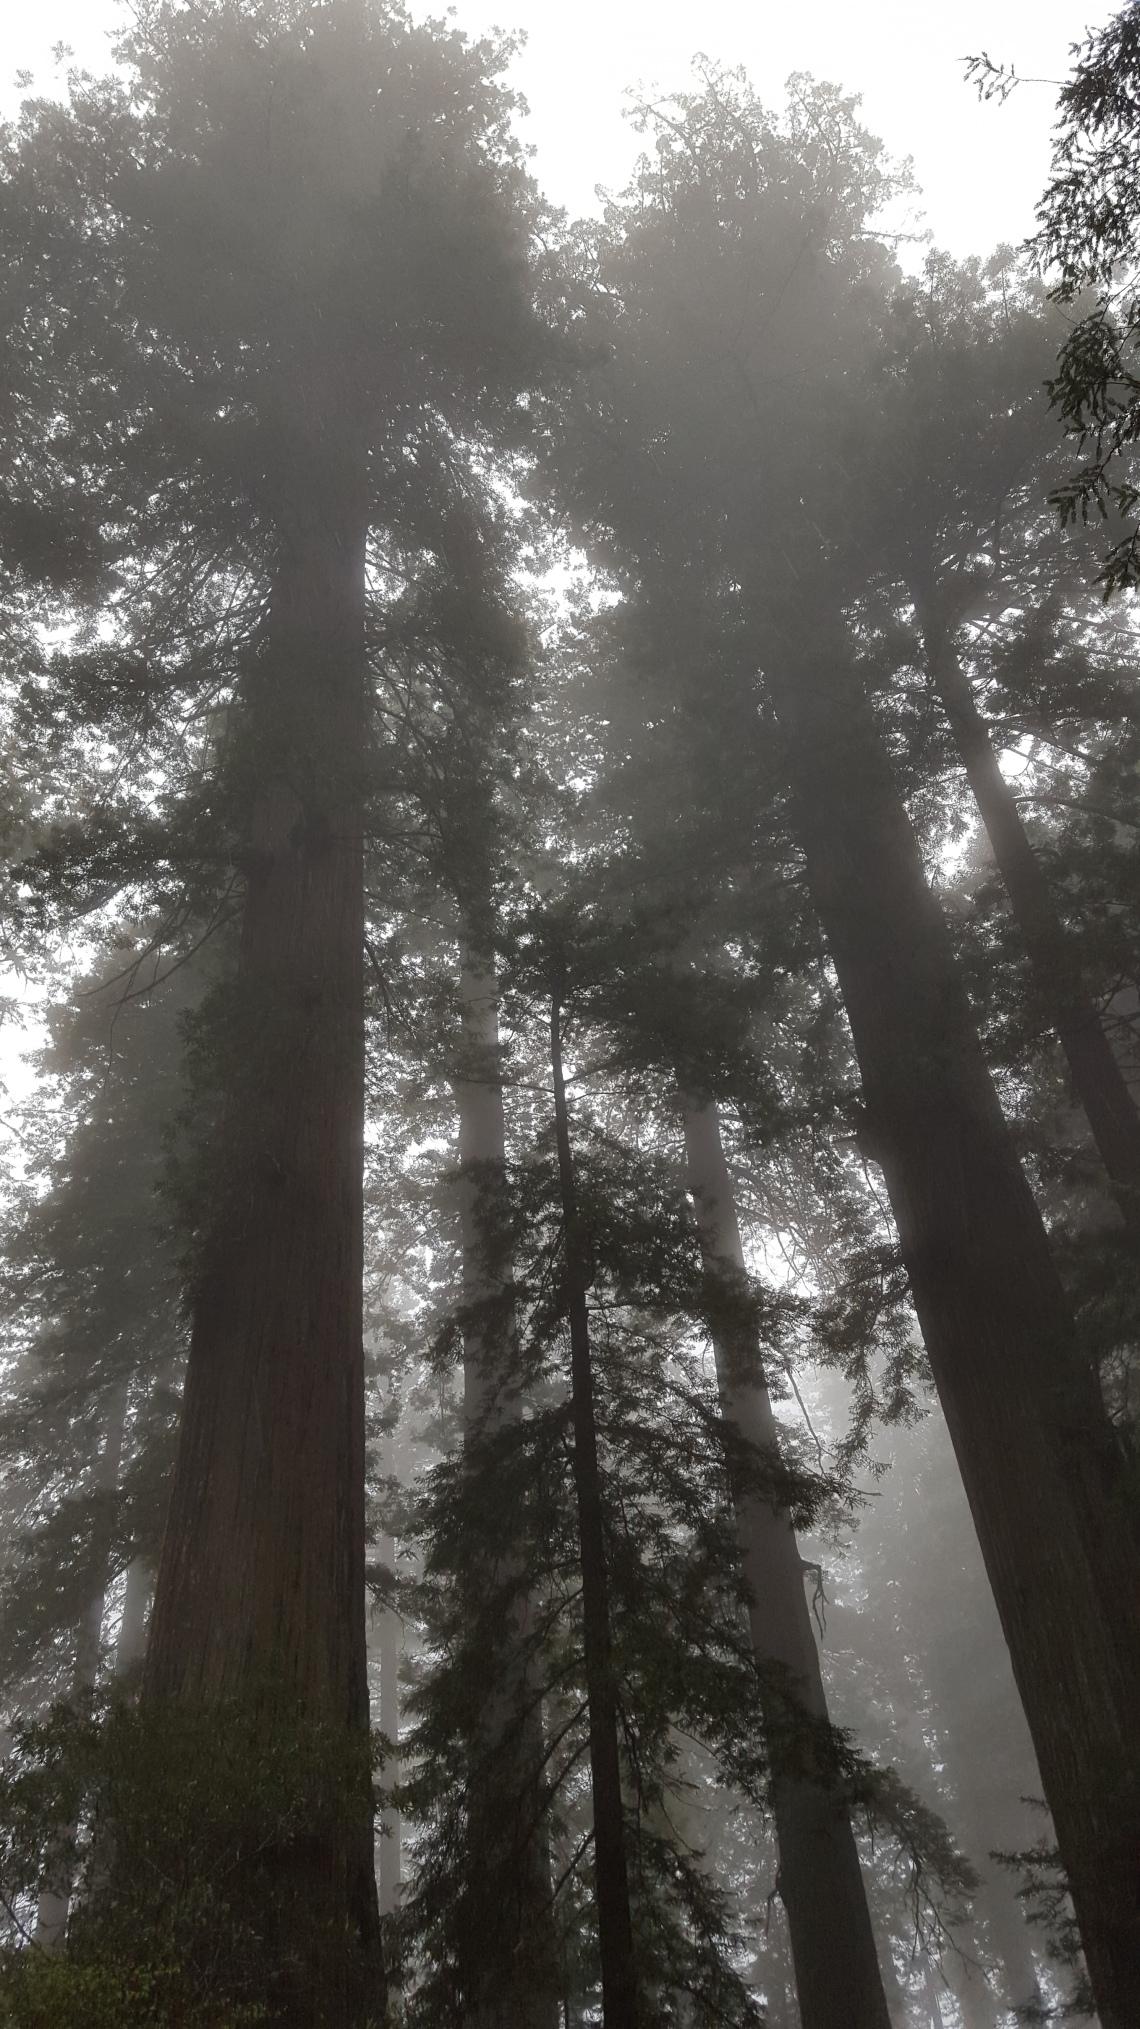 Lady Bird Johnson Grove Redwood National Parlk California 14.03.162016-03-14 12.03.26